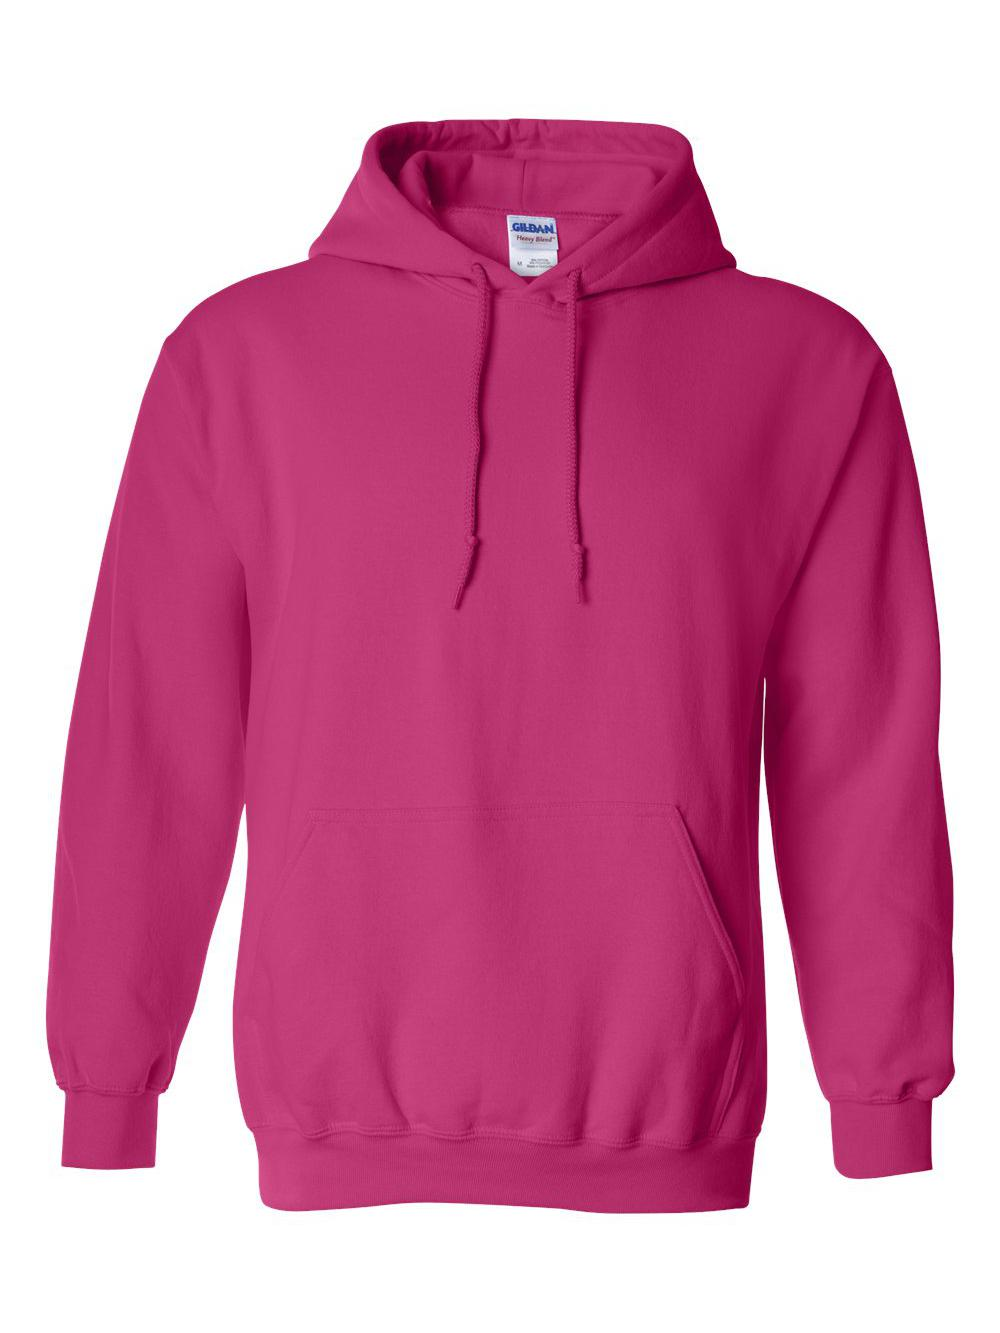 Gildan-Heavy-Blend-Hooded-Sweatshirt-18500 miniatura 60